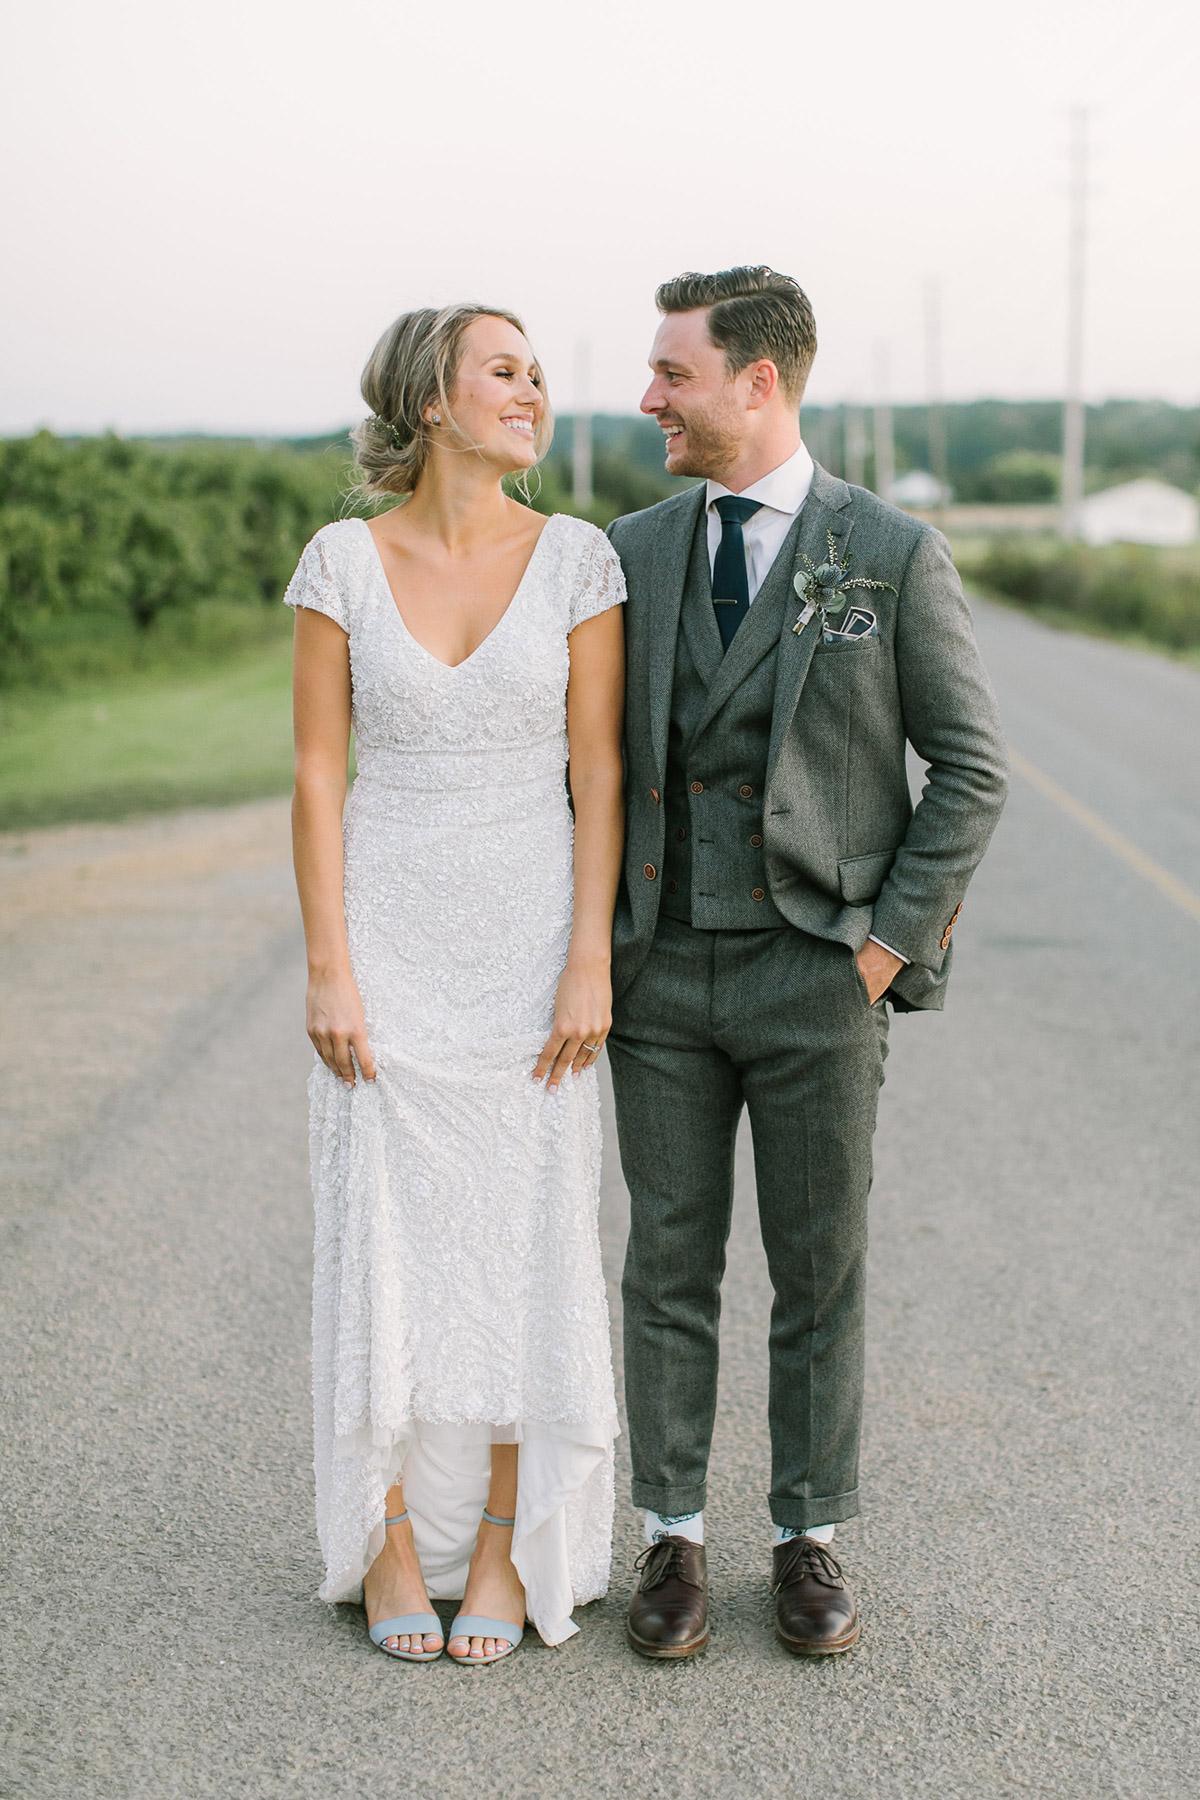 elizabeth-in-love-vineyard-bride-swish-list-cherry-avenue-farms-vineland-wedding-64.jpg